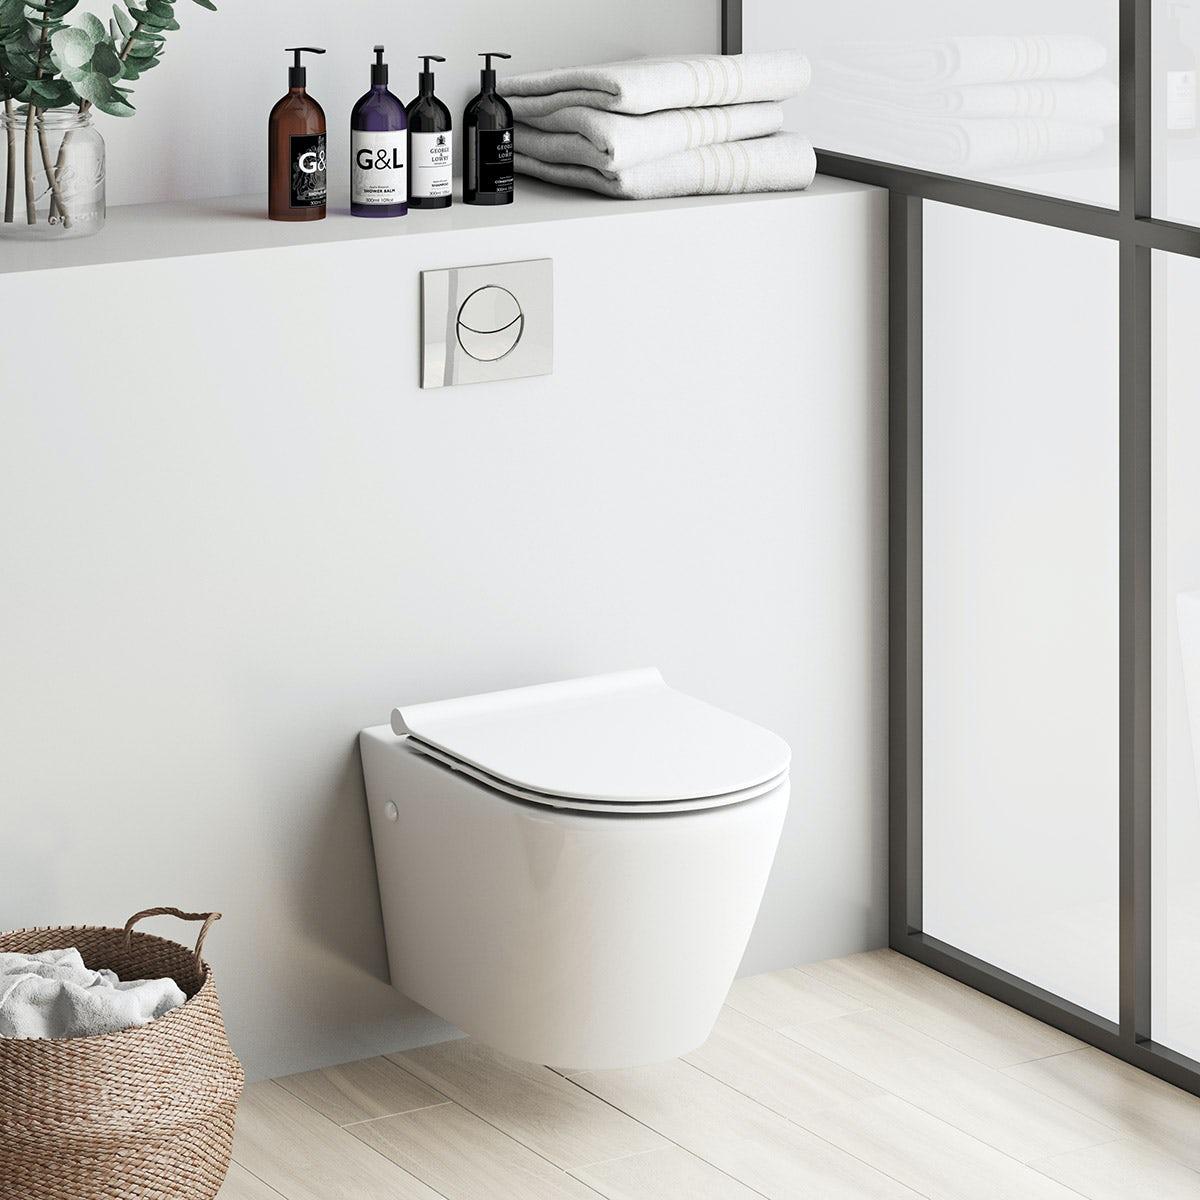 Mode Harrison Wall Hung Toilet Inc Slimline Soft Close